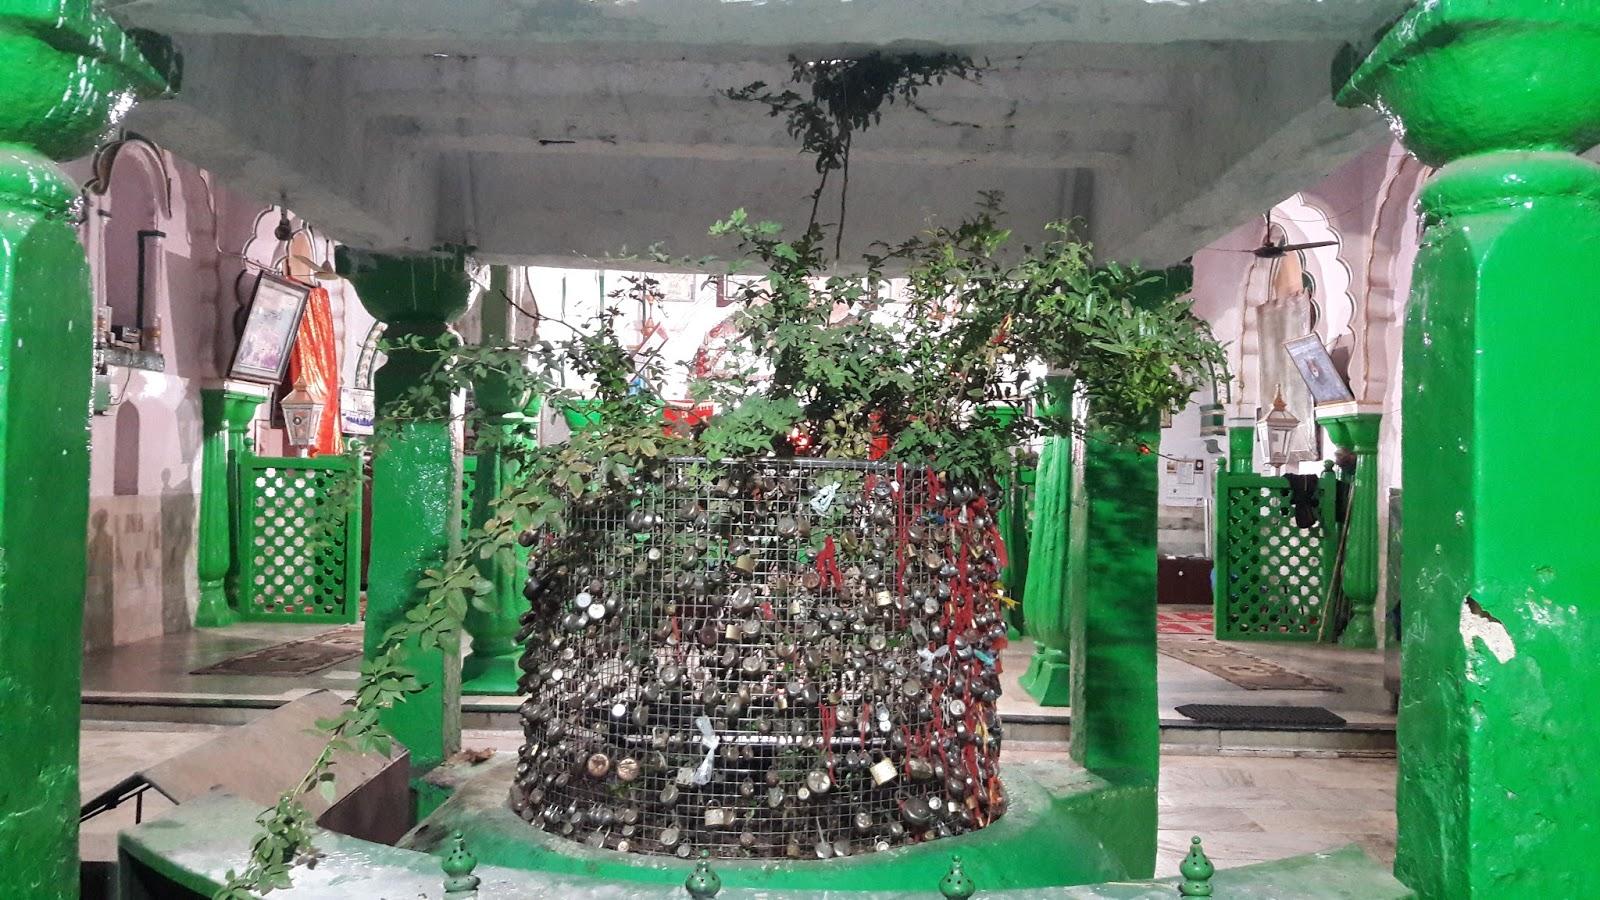 Maula Ali Shrine Wallpaper: Muharram Mirror: Latest Photographs Of Maula Ali Shrine